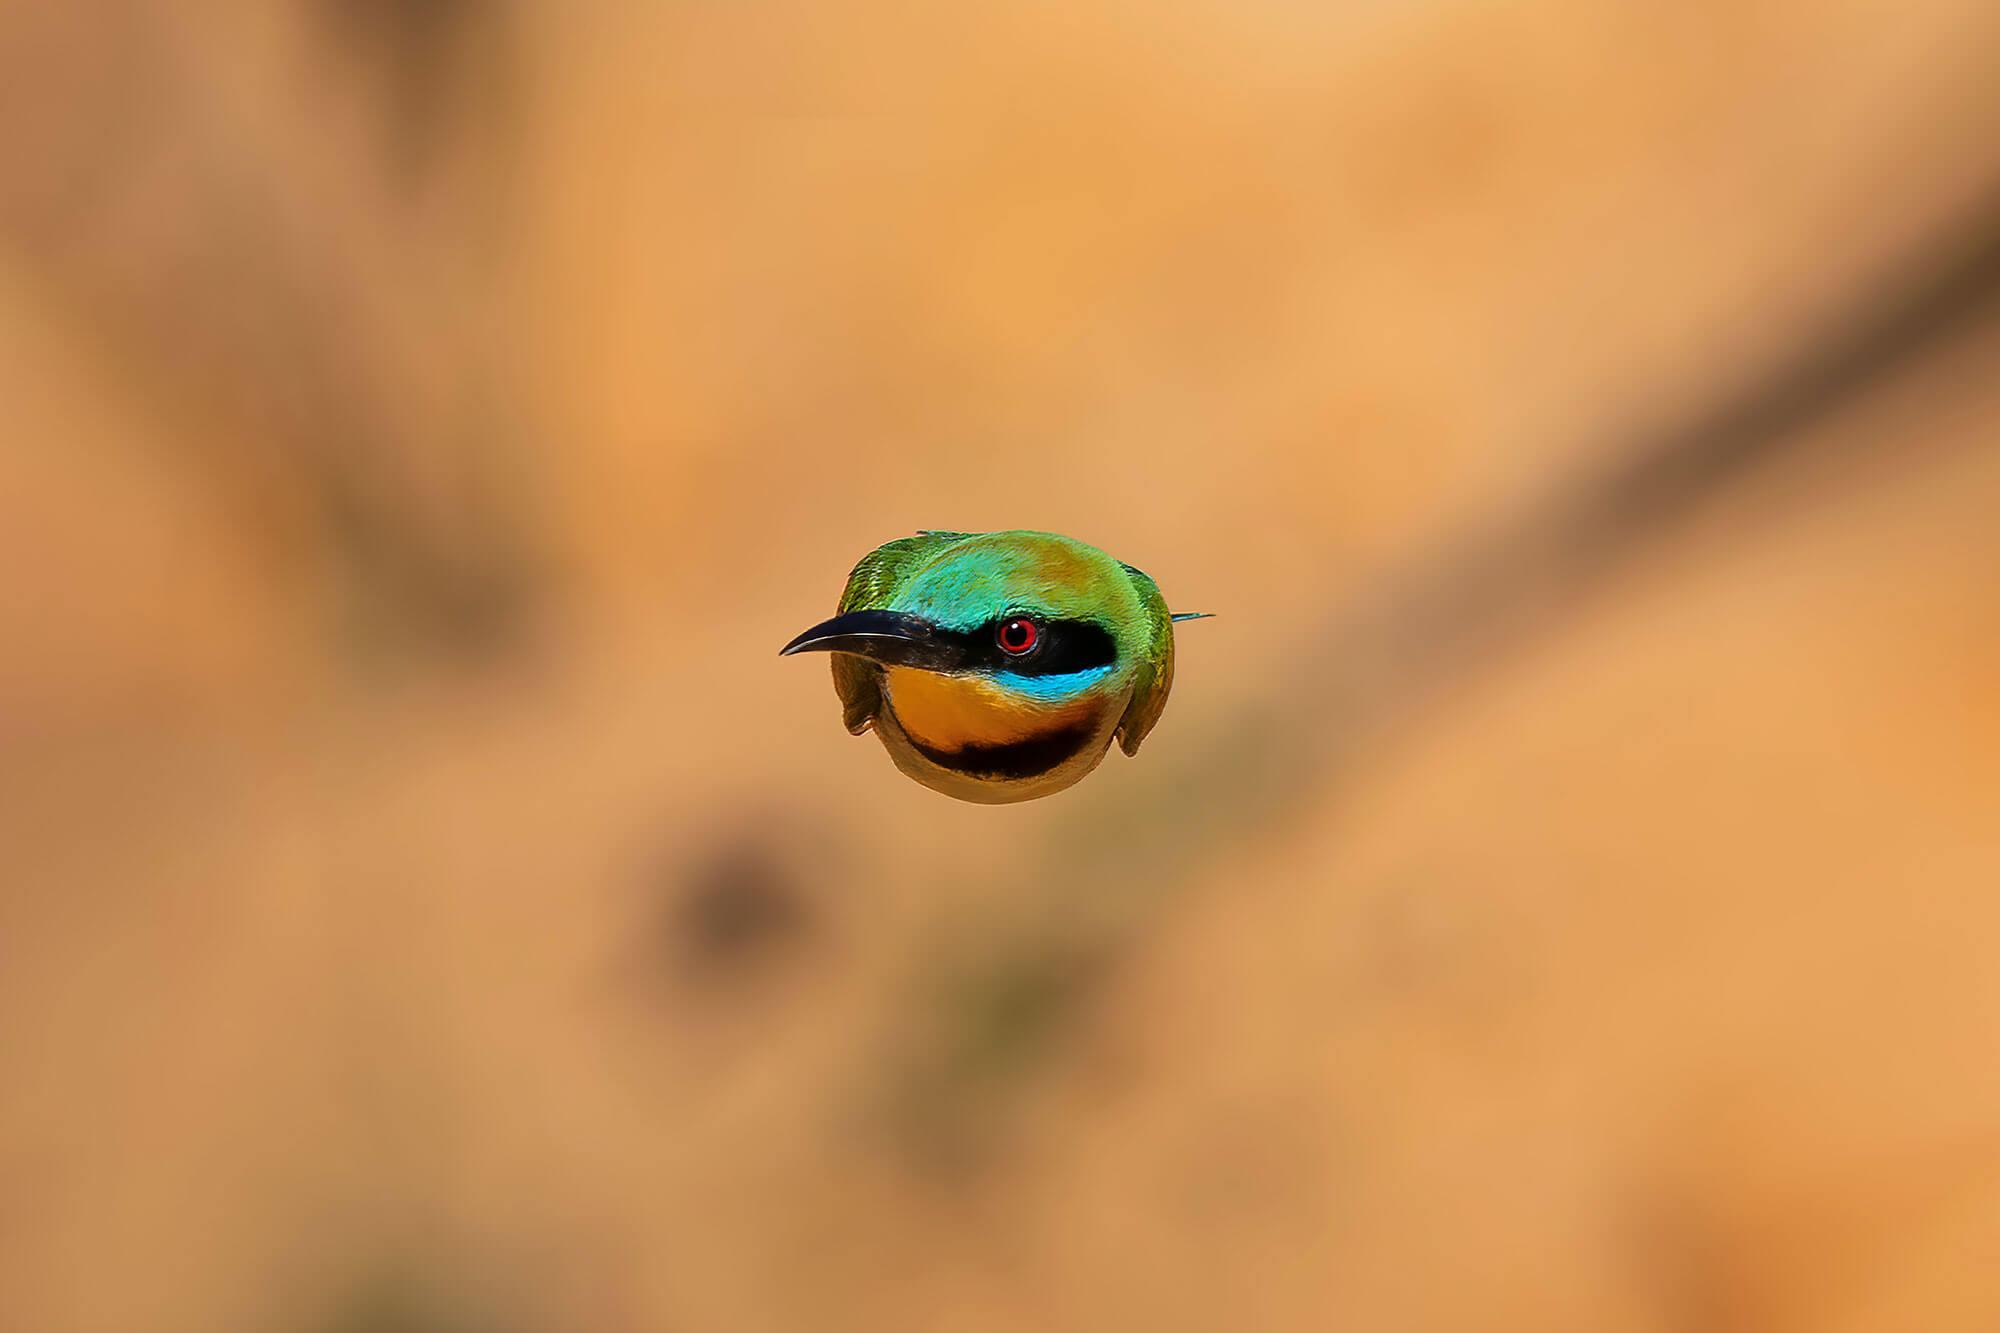 Photo of bird in flight by Michael Jury